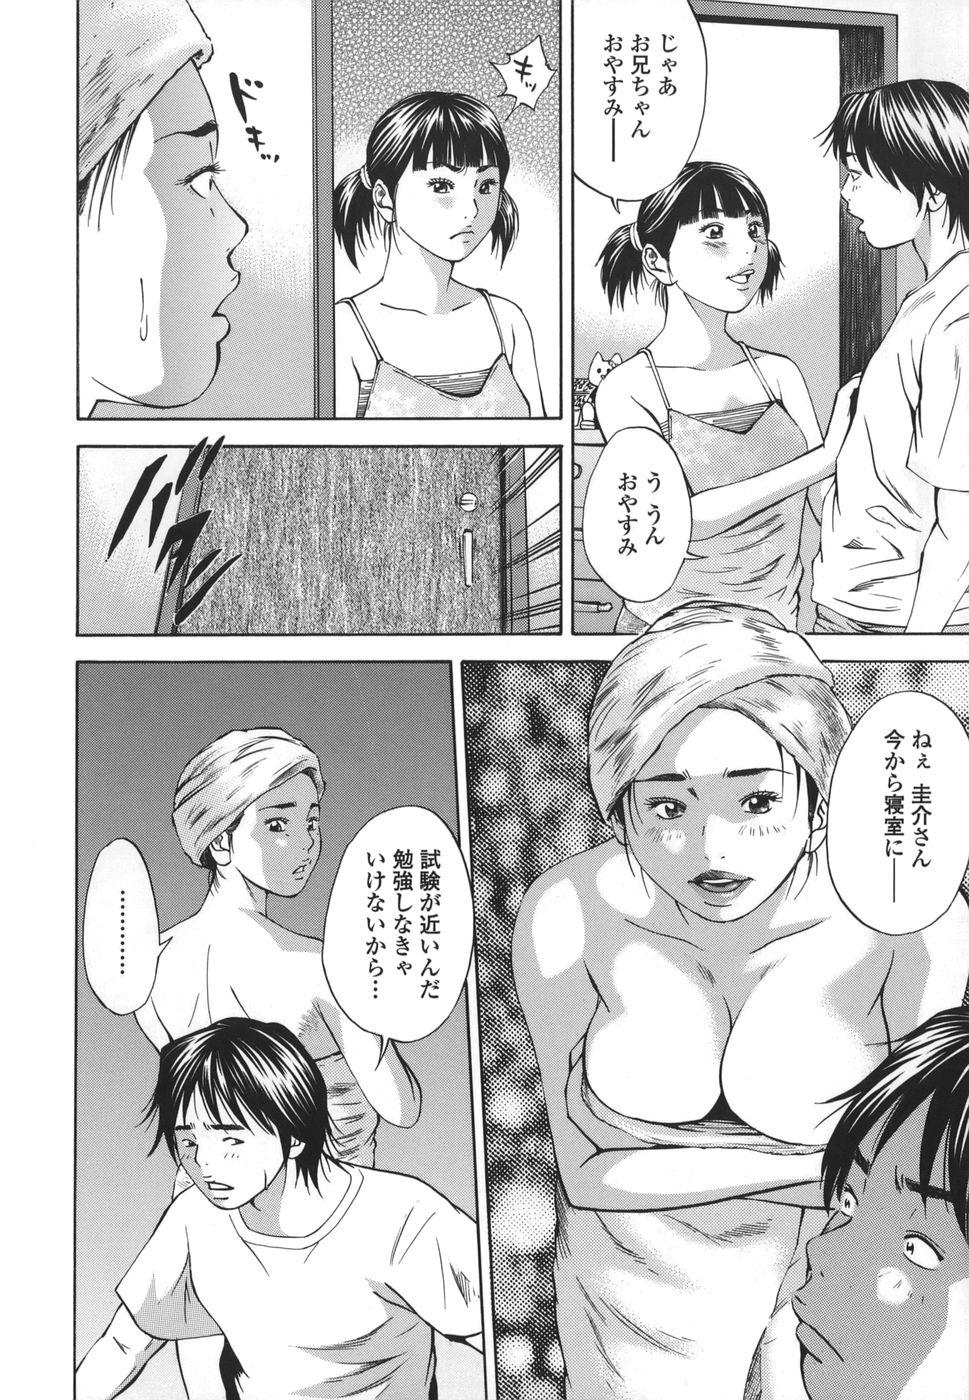 Kinshin Goukan - Near Relation Rapes 49